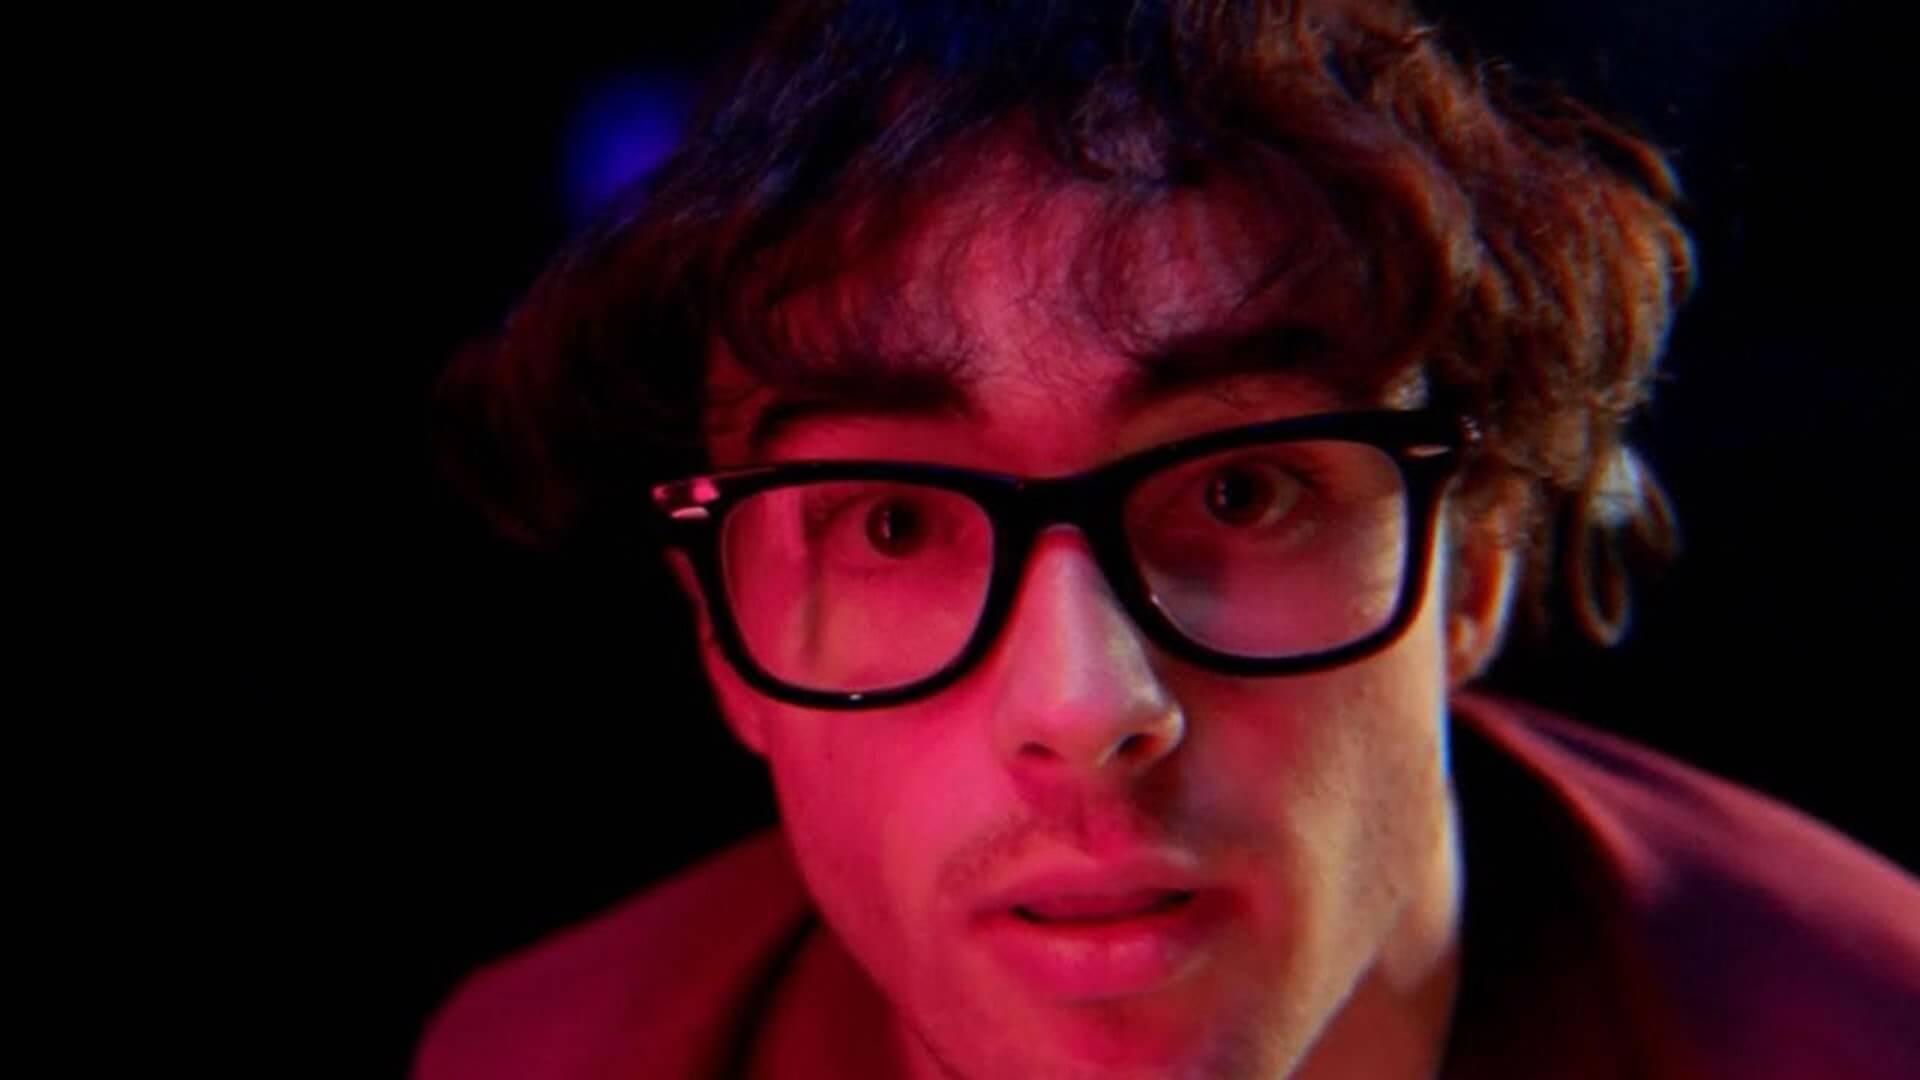 UK出身18歳のSSW・Alfie Templemanが日本の音楽に影響を受けたミニアルバムをリリース!MVも公開 music210510_alfie-empleman-210510_4